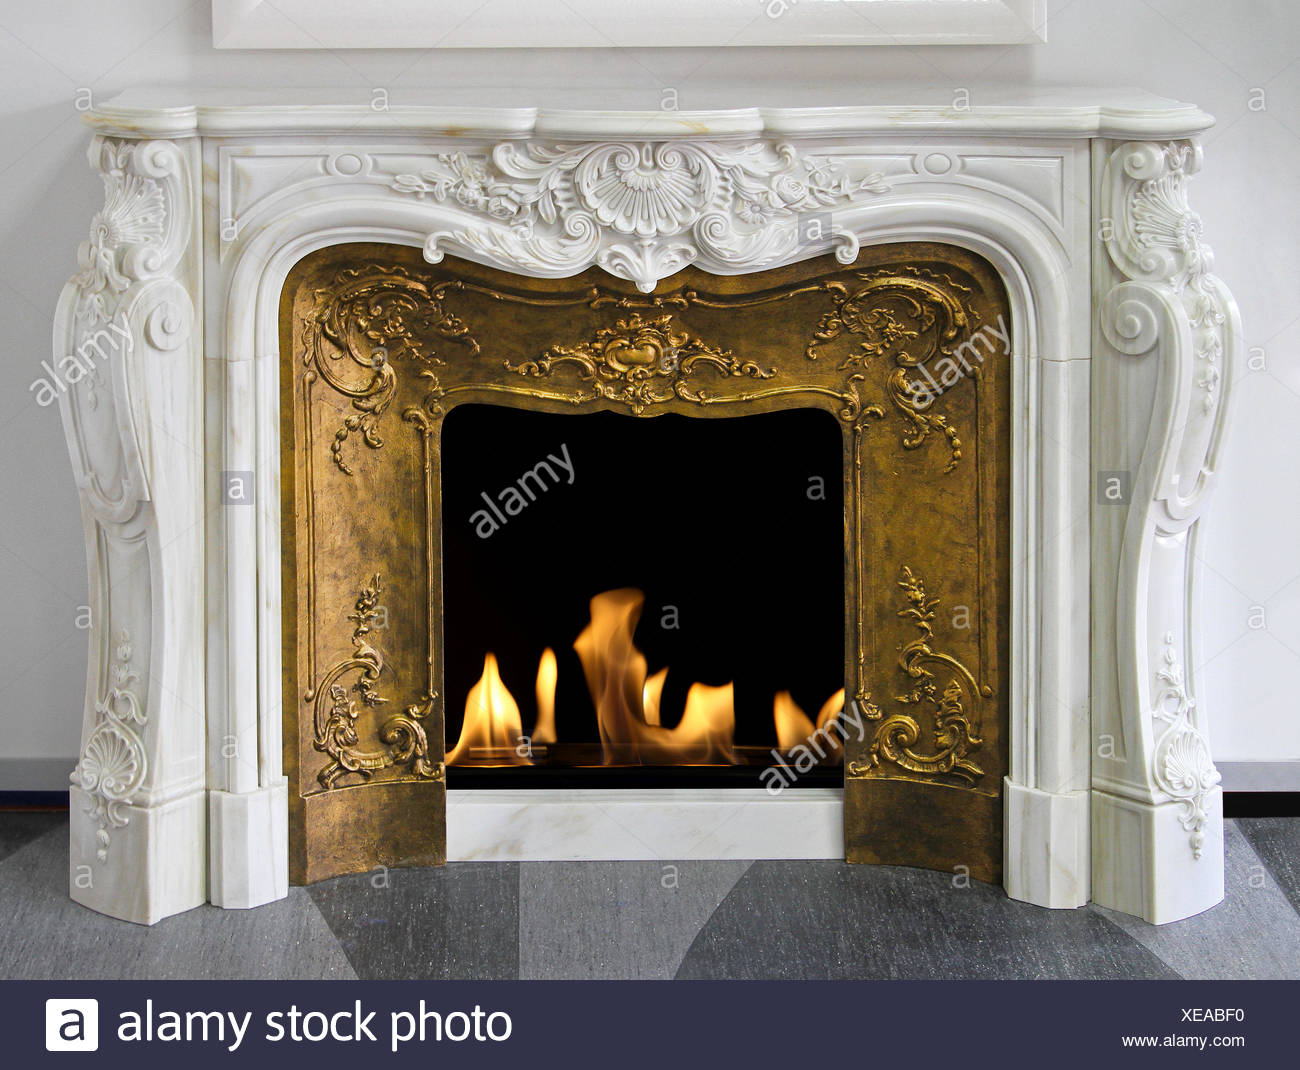 Fireplace - Stock Image